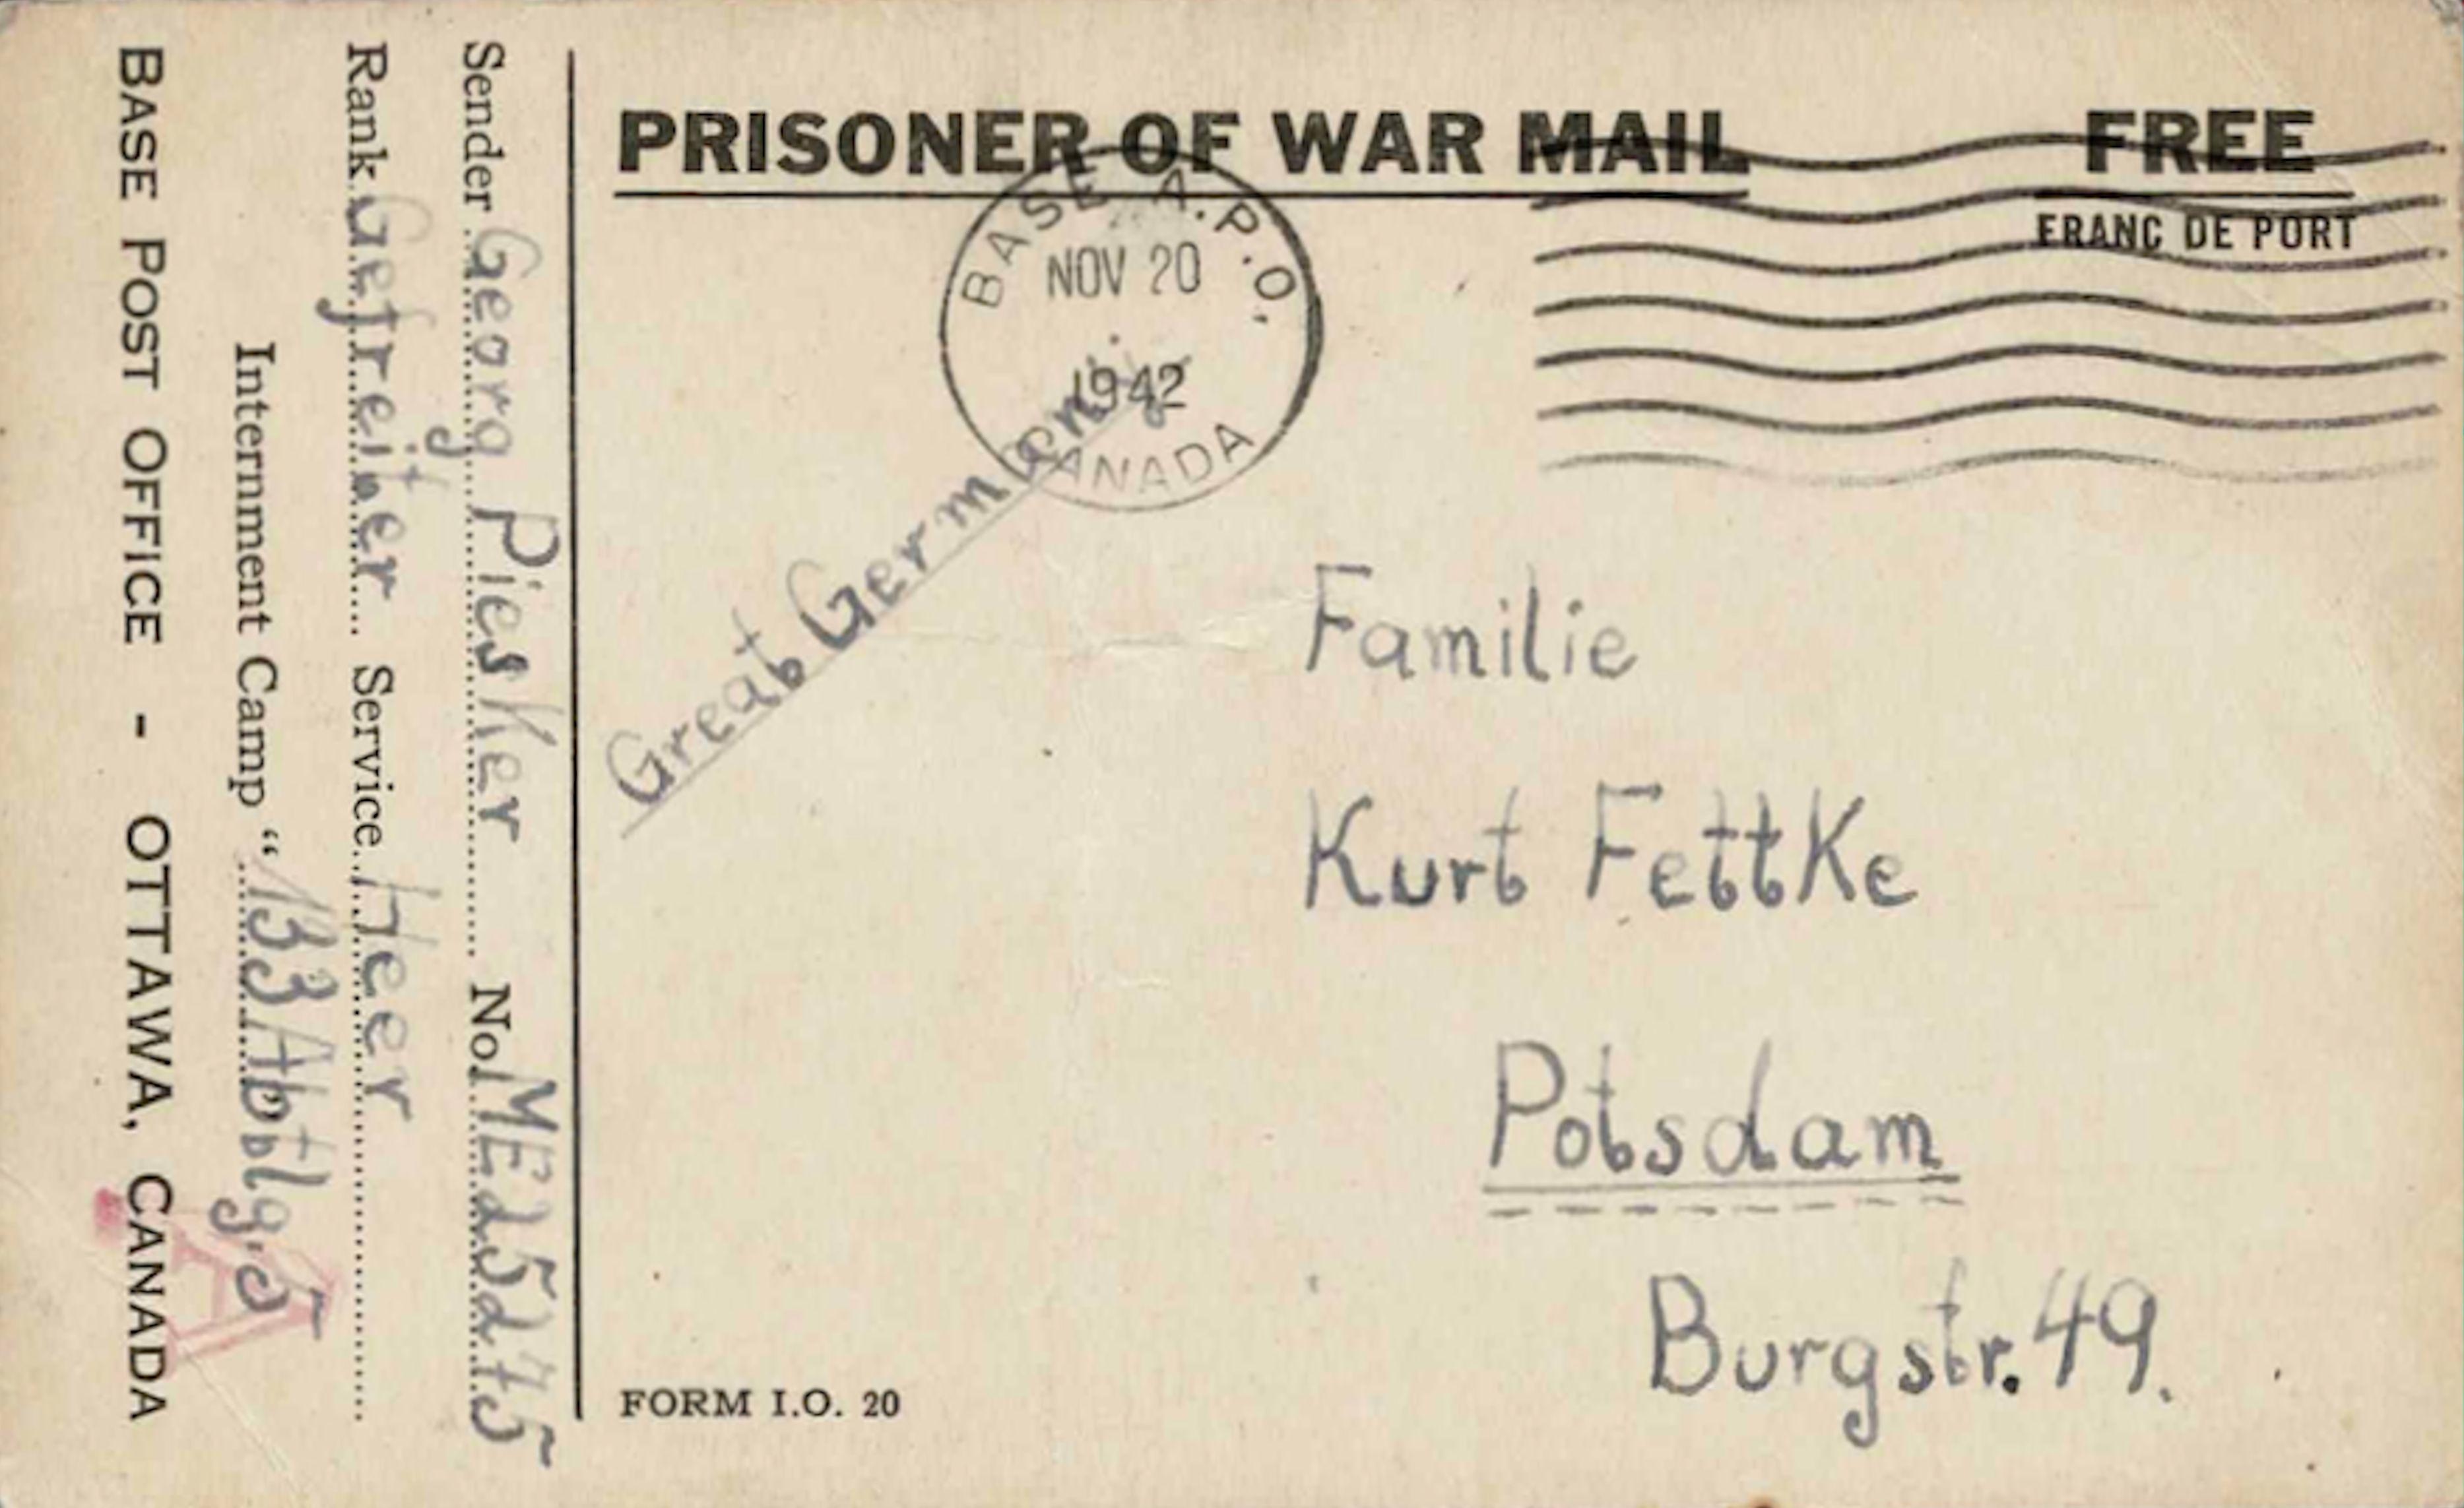 1942;Canada;The War Prisoners Aid of the YMCA ; WW II-Era Christmas POW Card